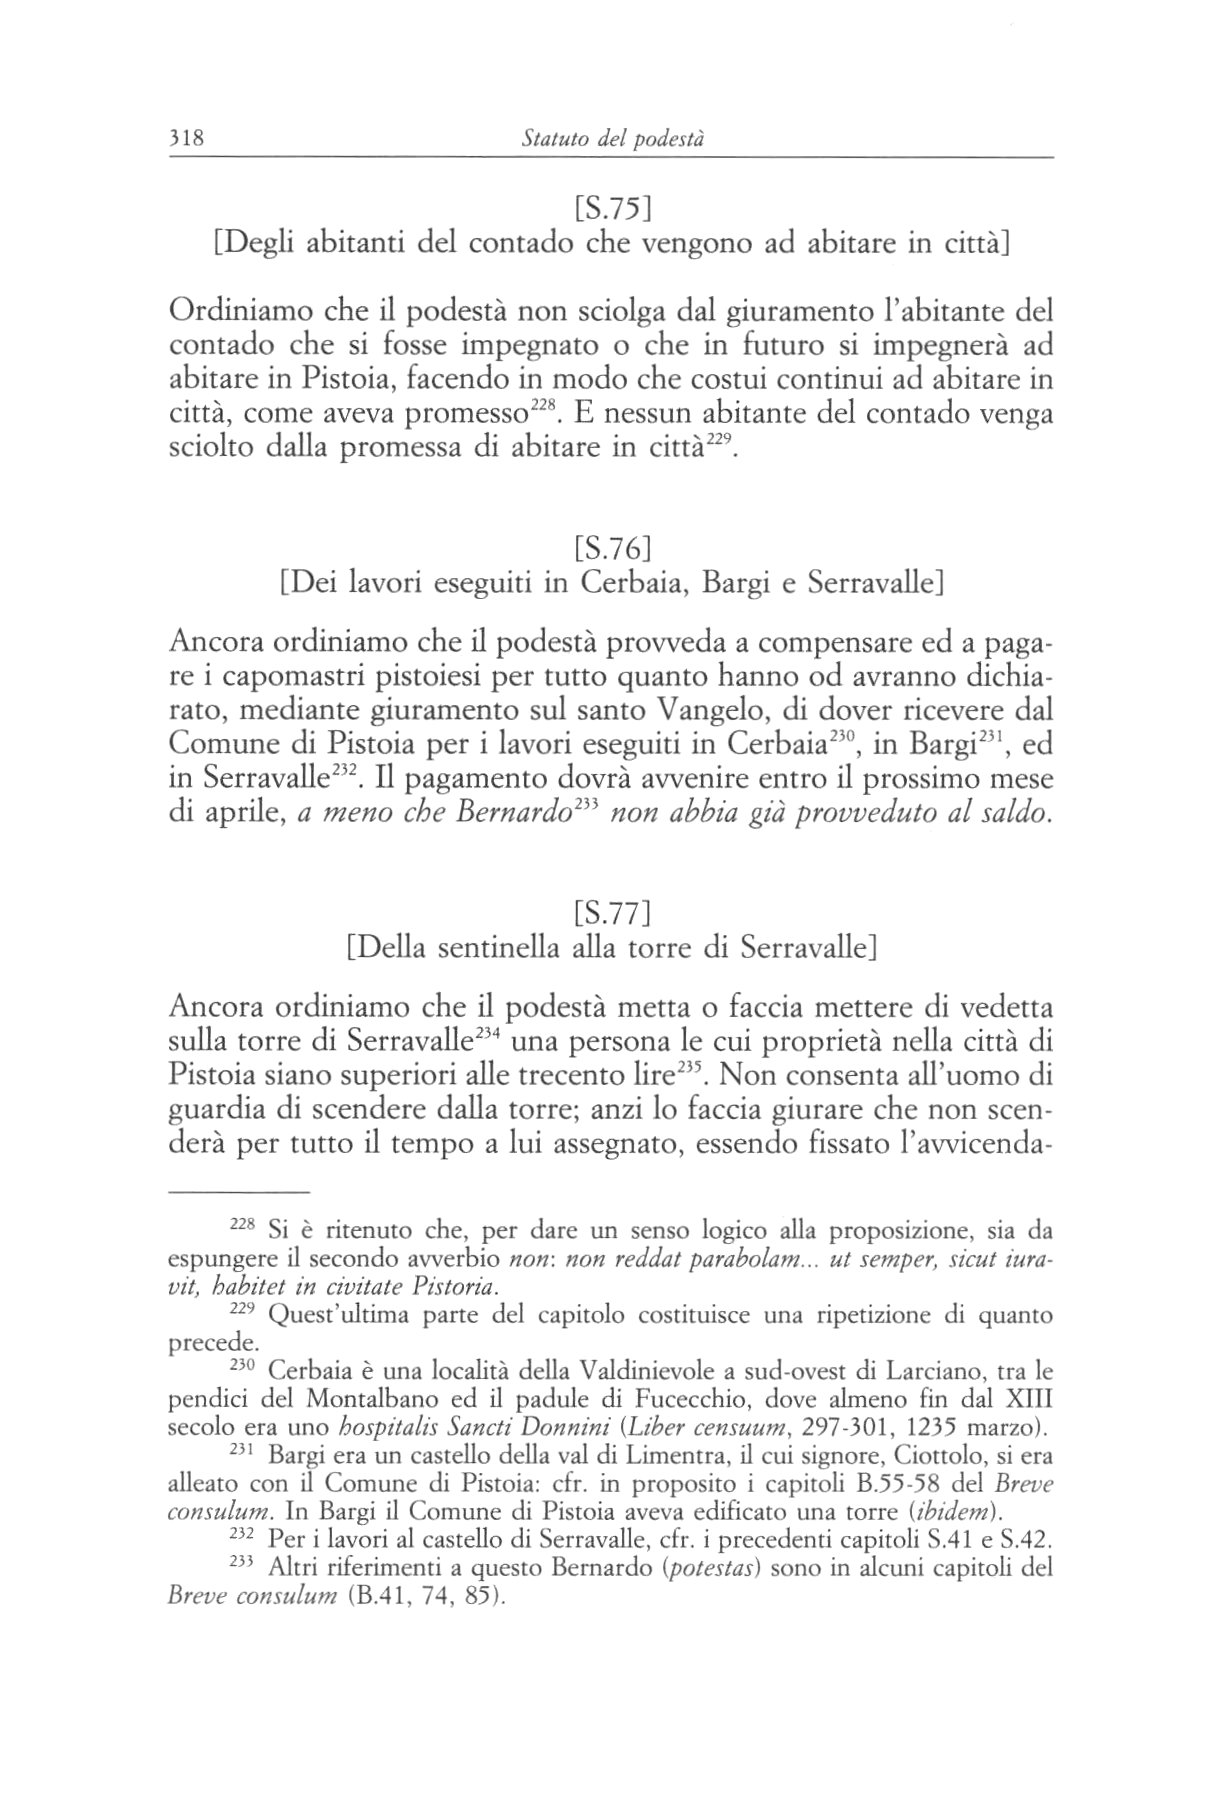 statuti pistoiesi del sec.XII 0318.jpg